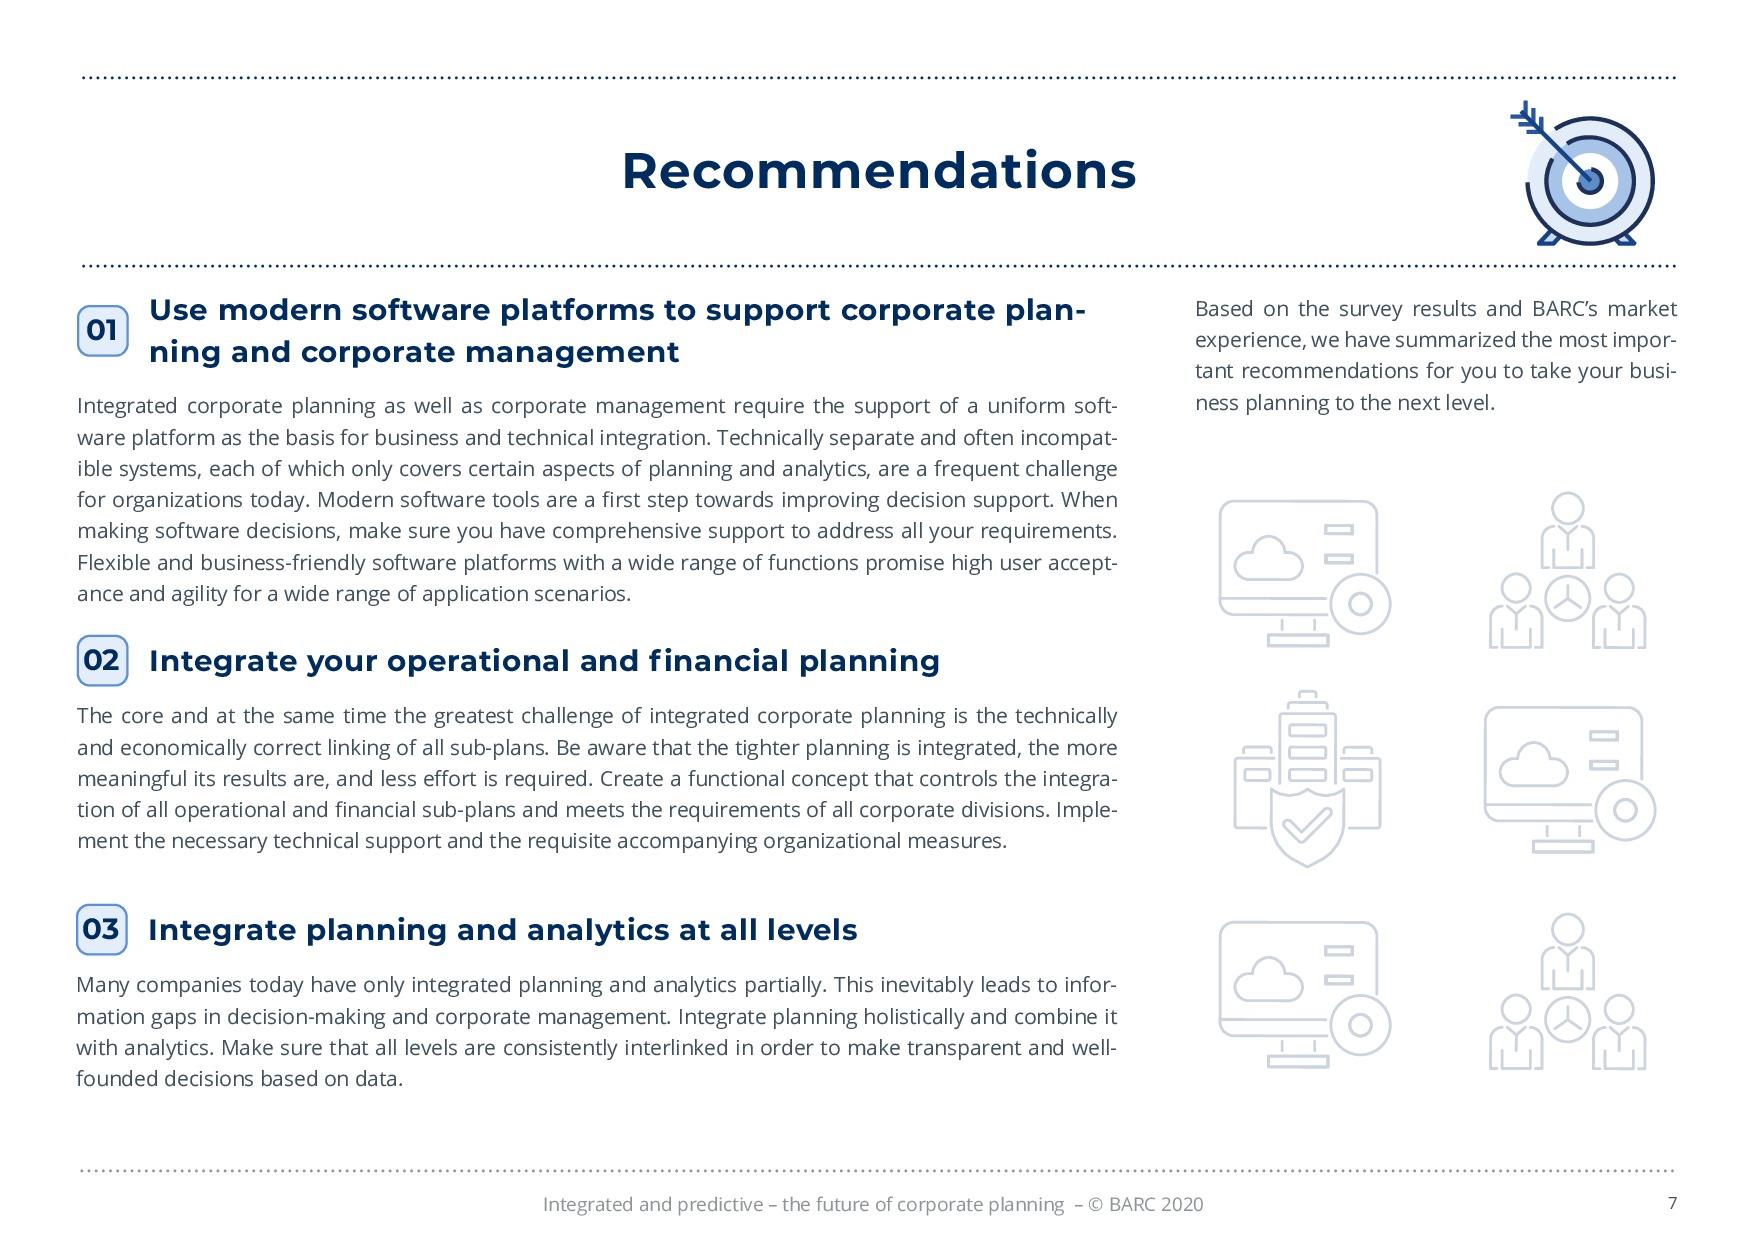 BARC – 統合と予測 – 経営計画の未来 | Page 7